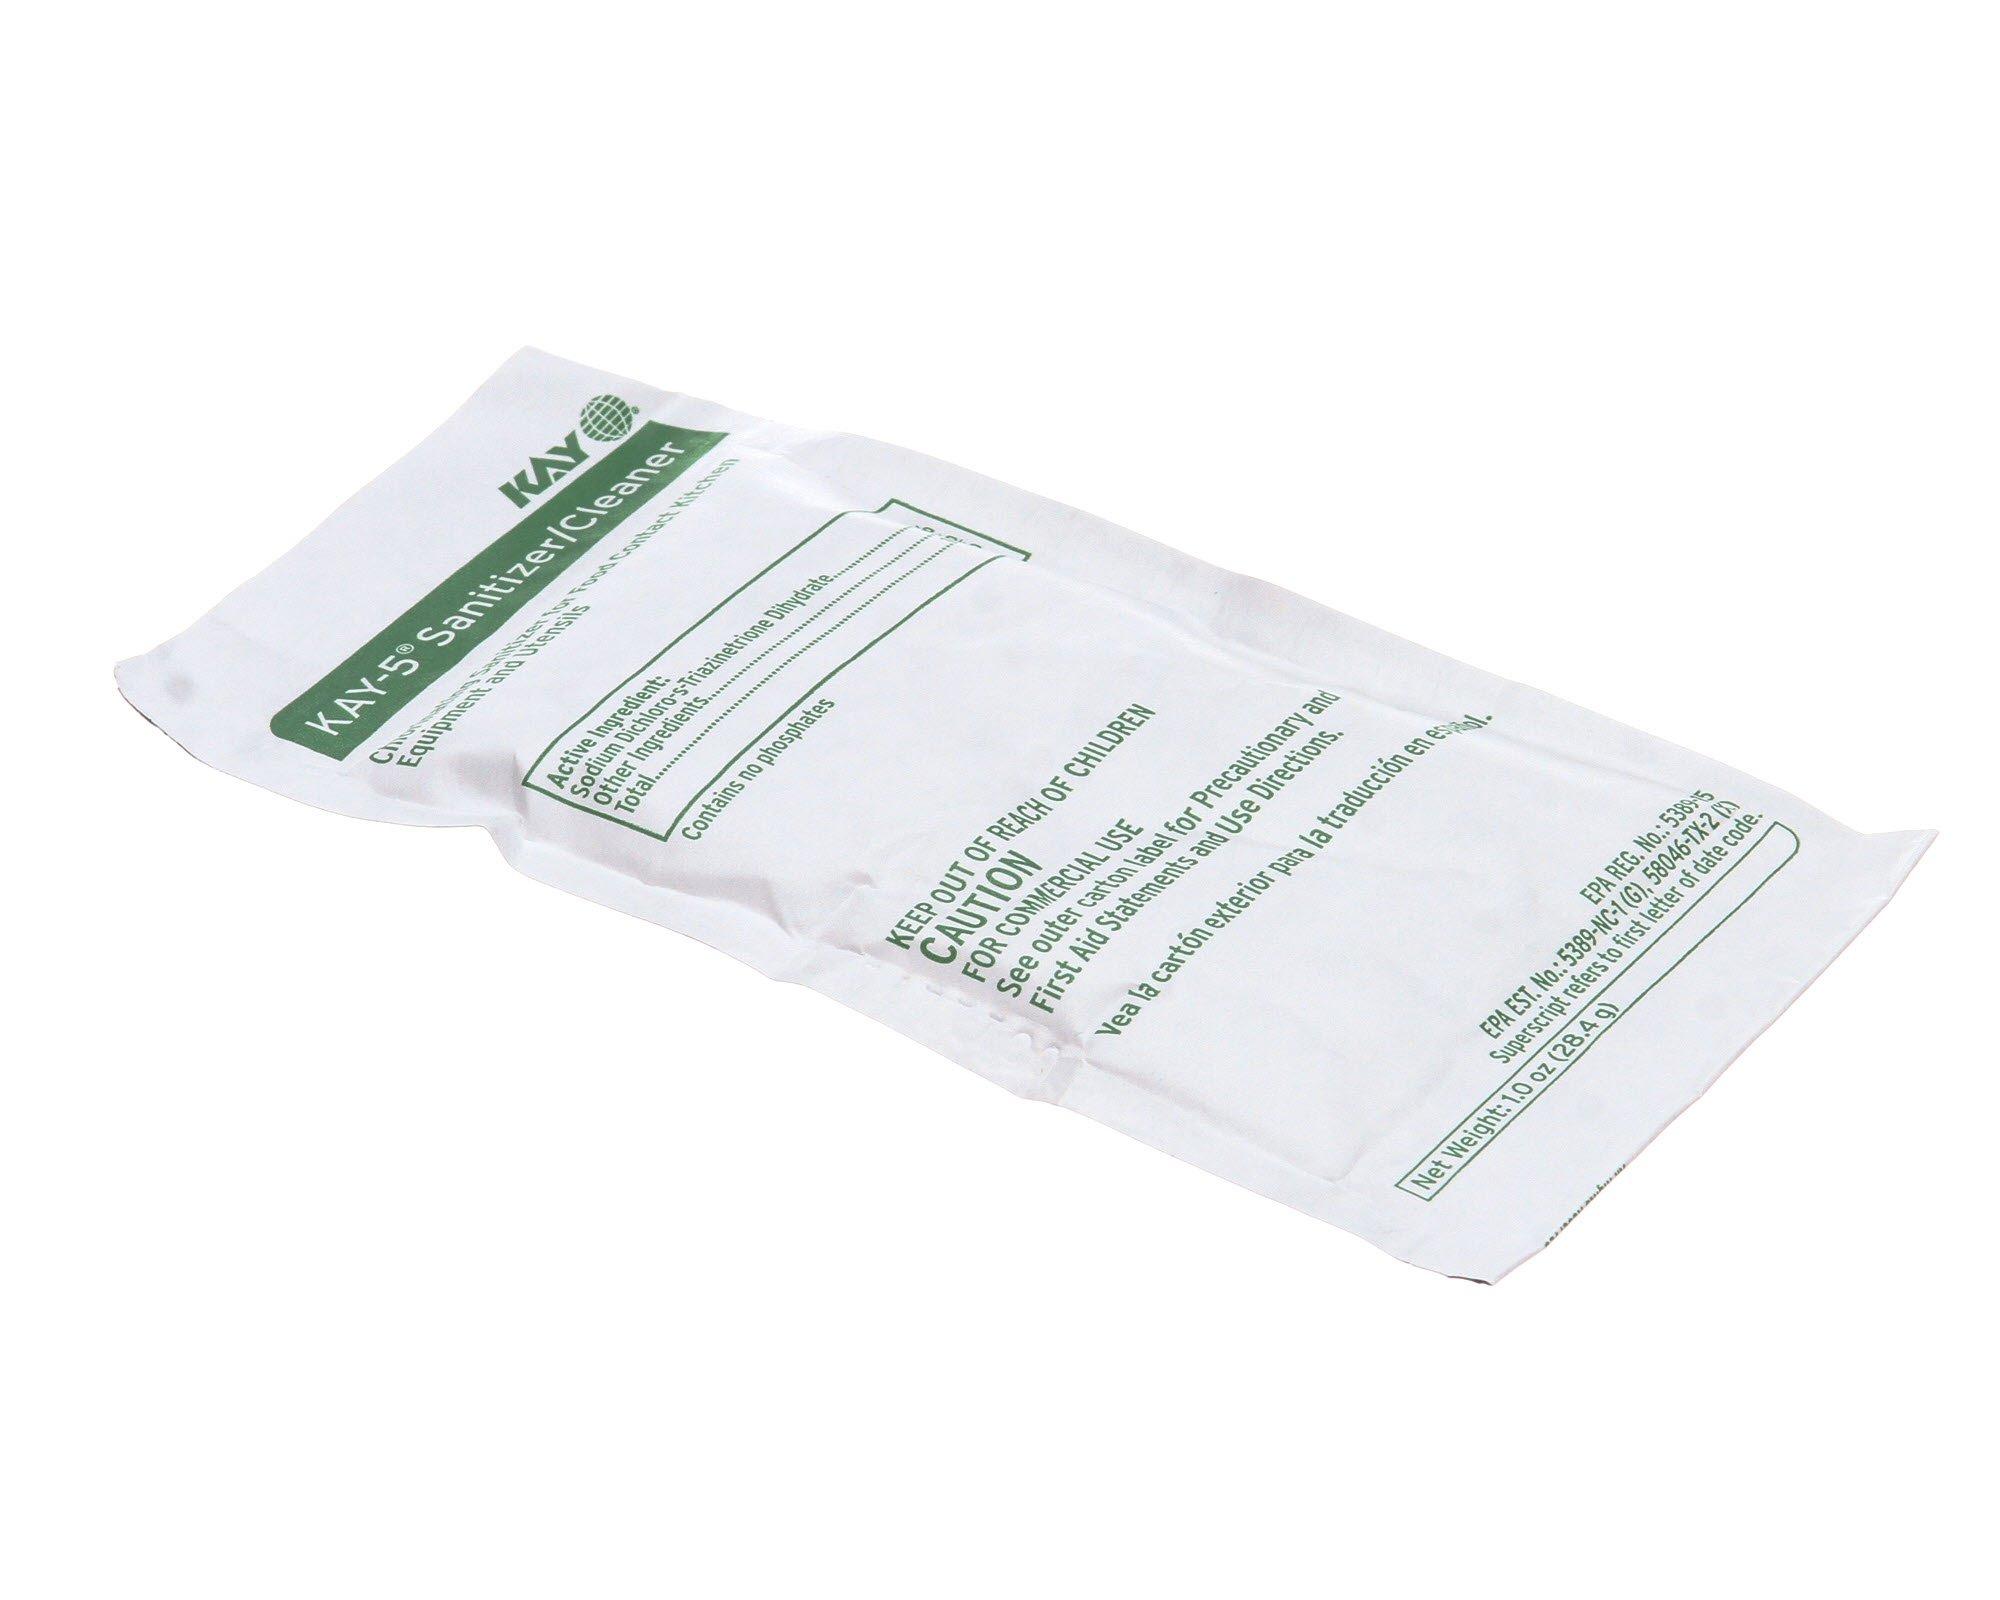 Bunn 24634.0001 Sanitizer, Kay-5